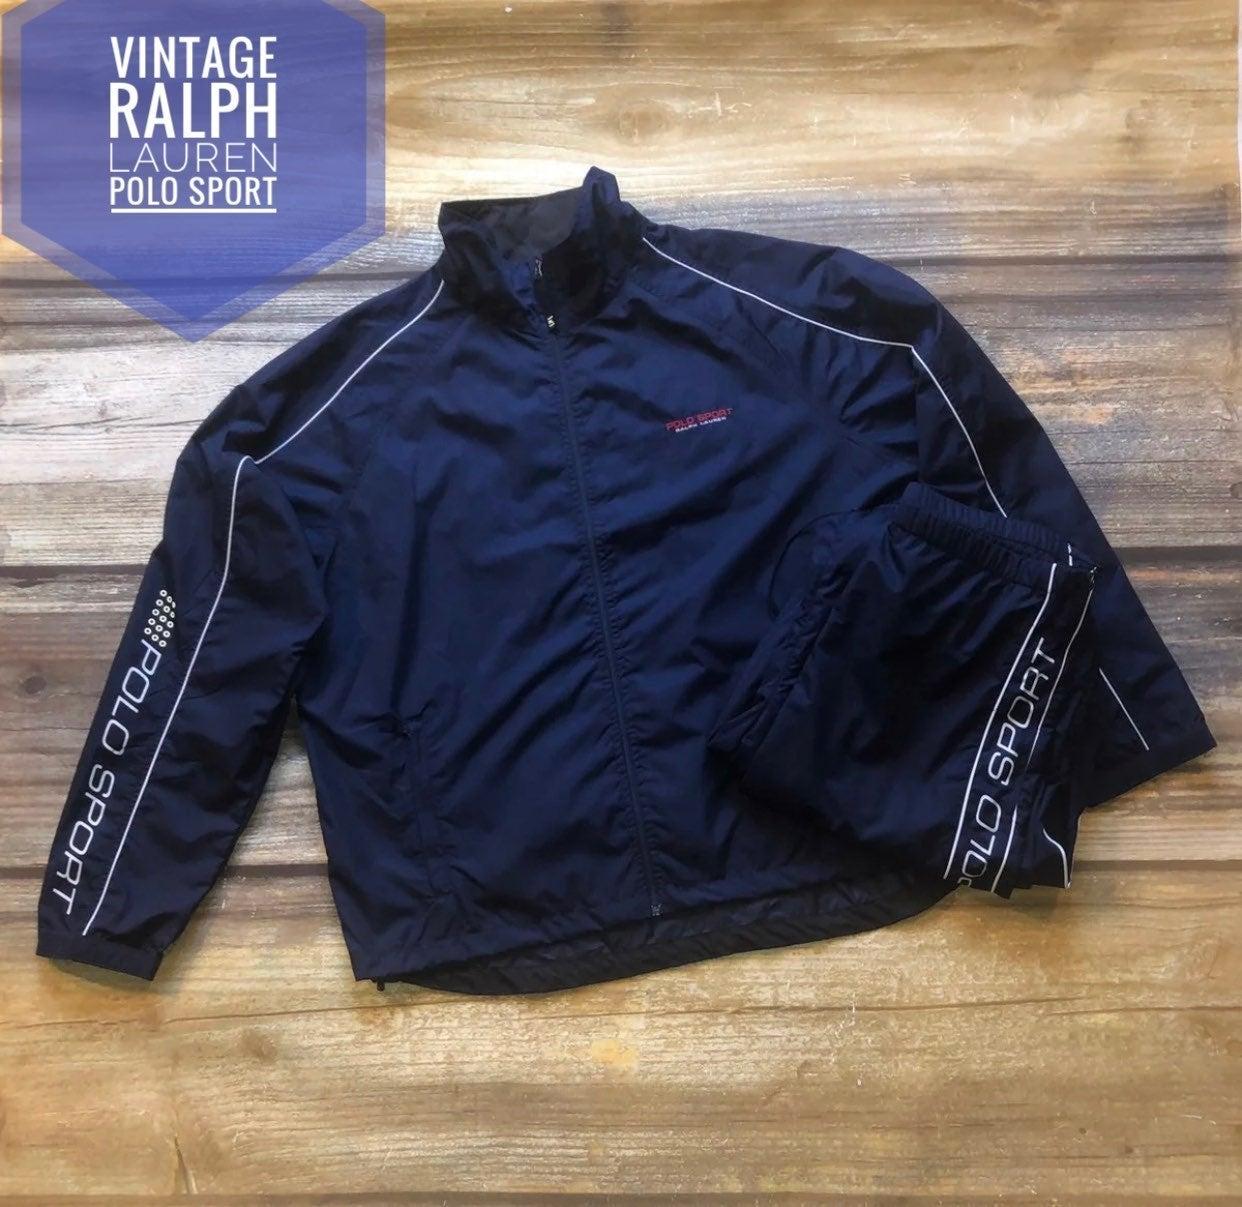 Ralph Lauren like new vintage track suit